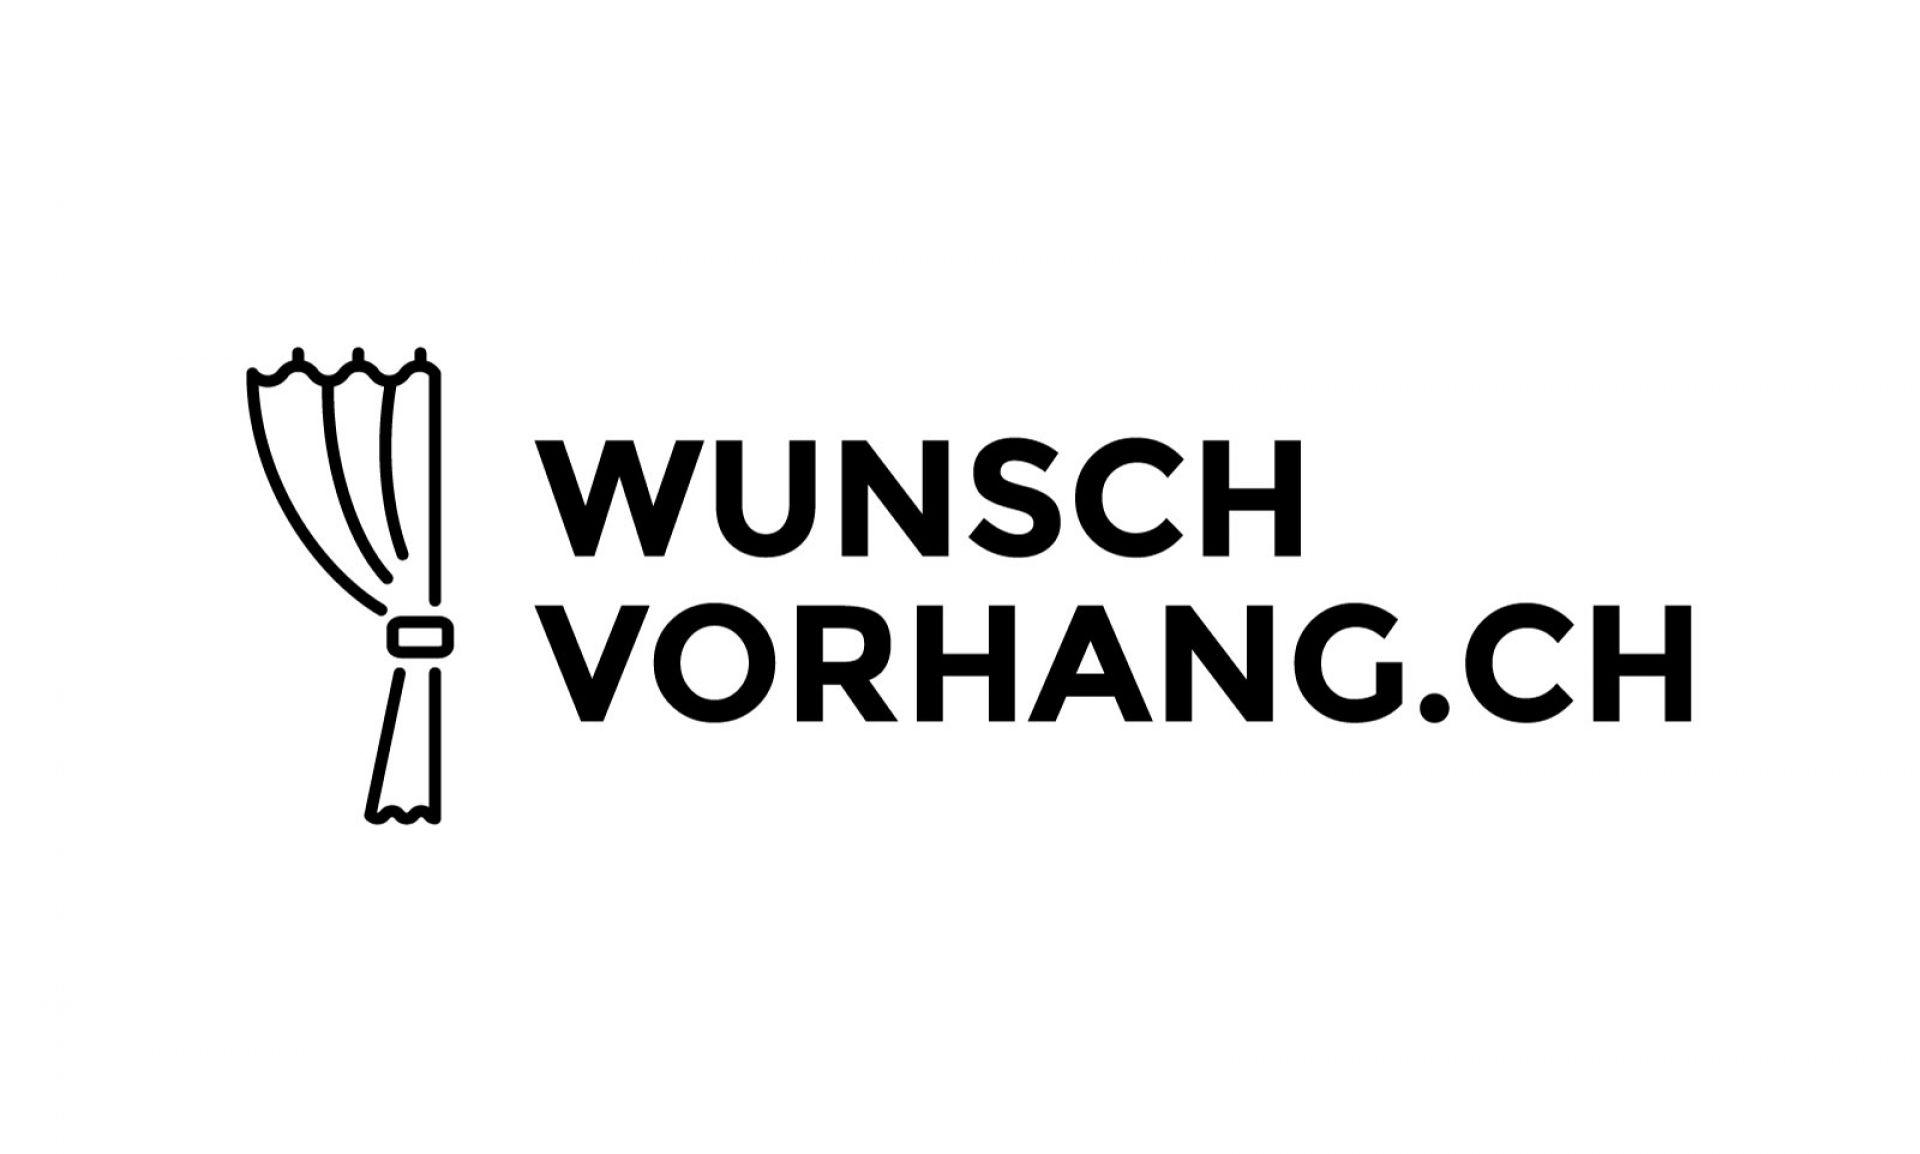 Wunschvorhang.ch